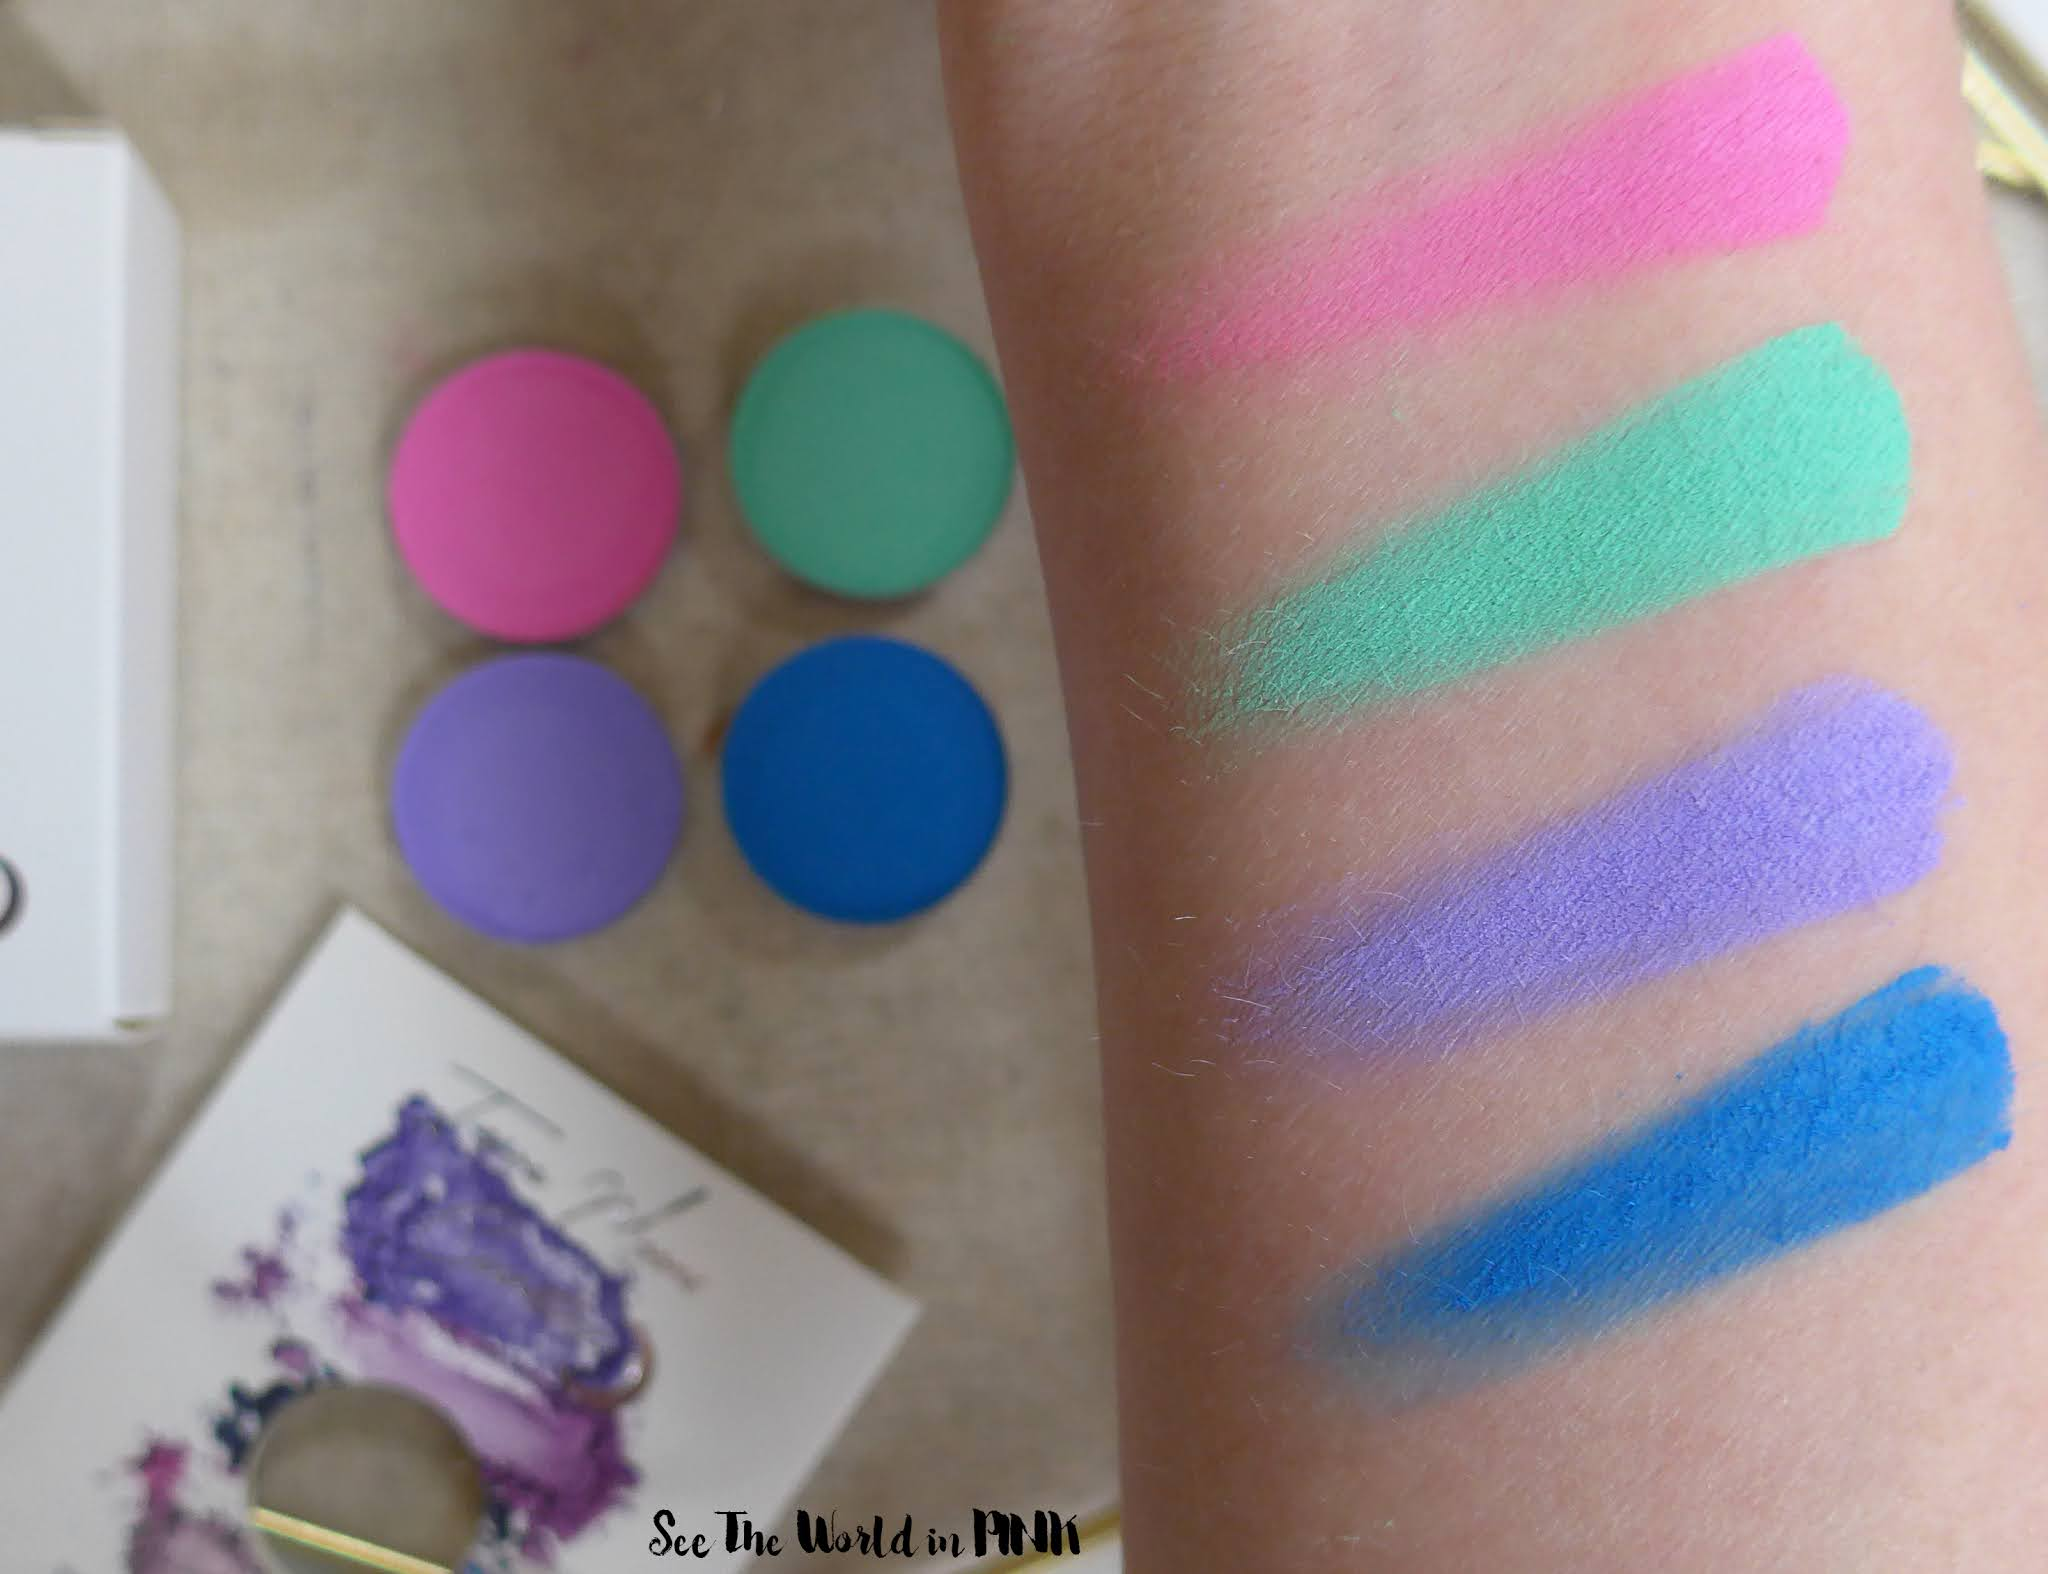 Terra Moons Cosmetics Urban Outfitters Exclusive Celestial Eyeshadow Set - Cosmic Neon